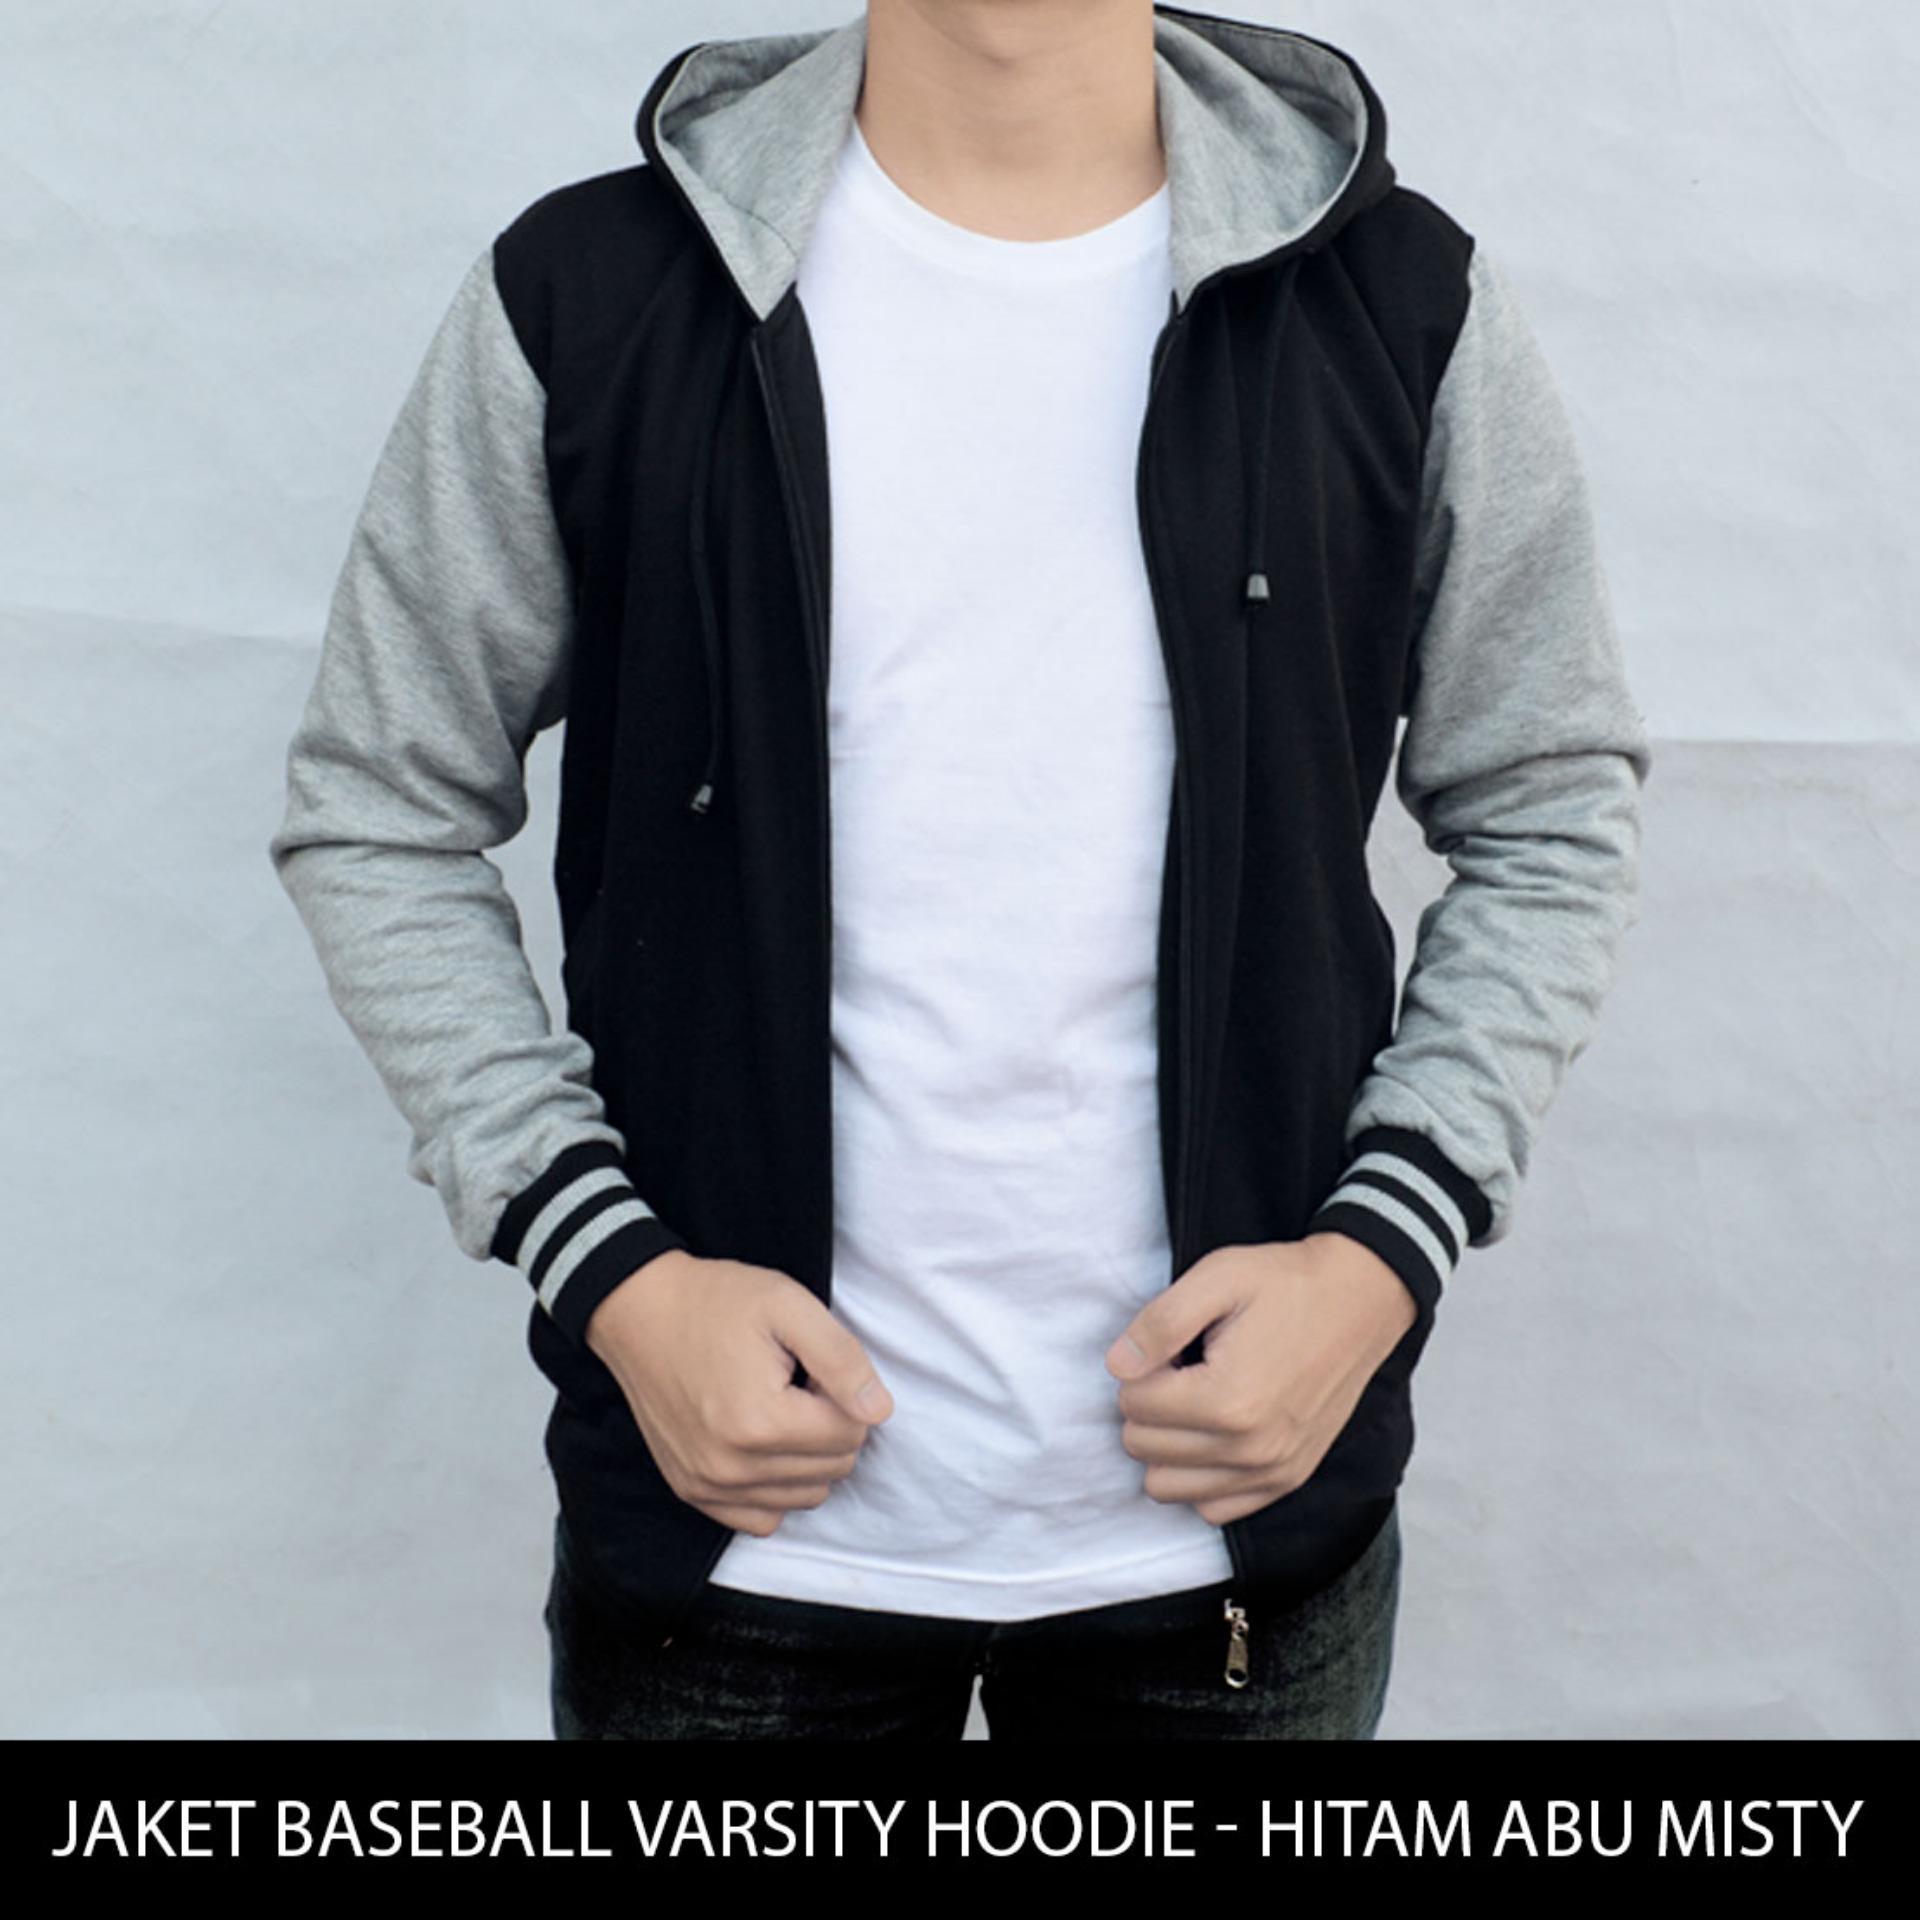 [BIG SIZE] Jaket Polos Baseball Varsity Hoodie - Hitam Abu Misty XXL-XXXL ...